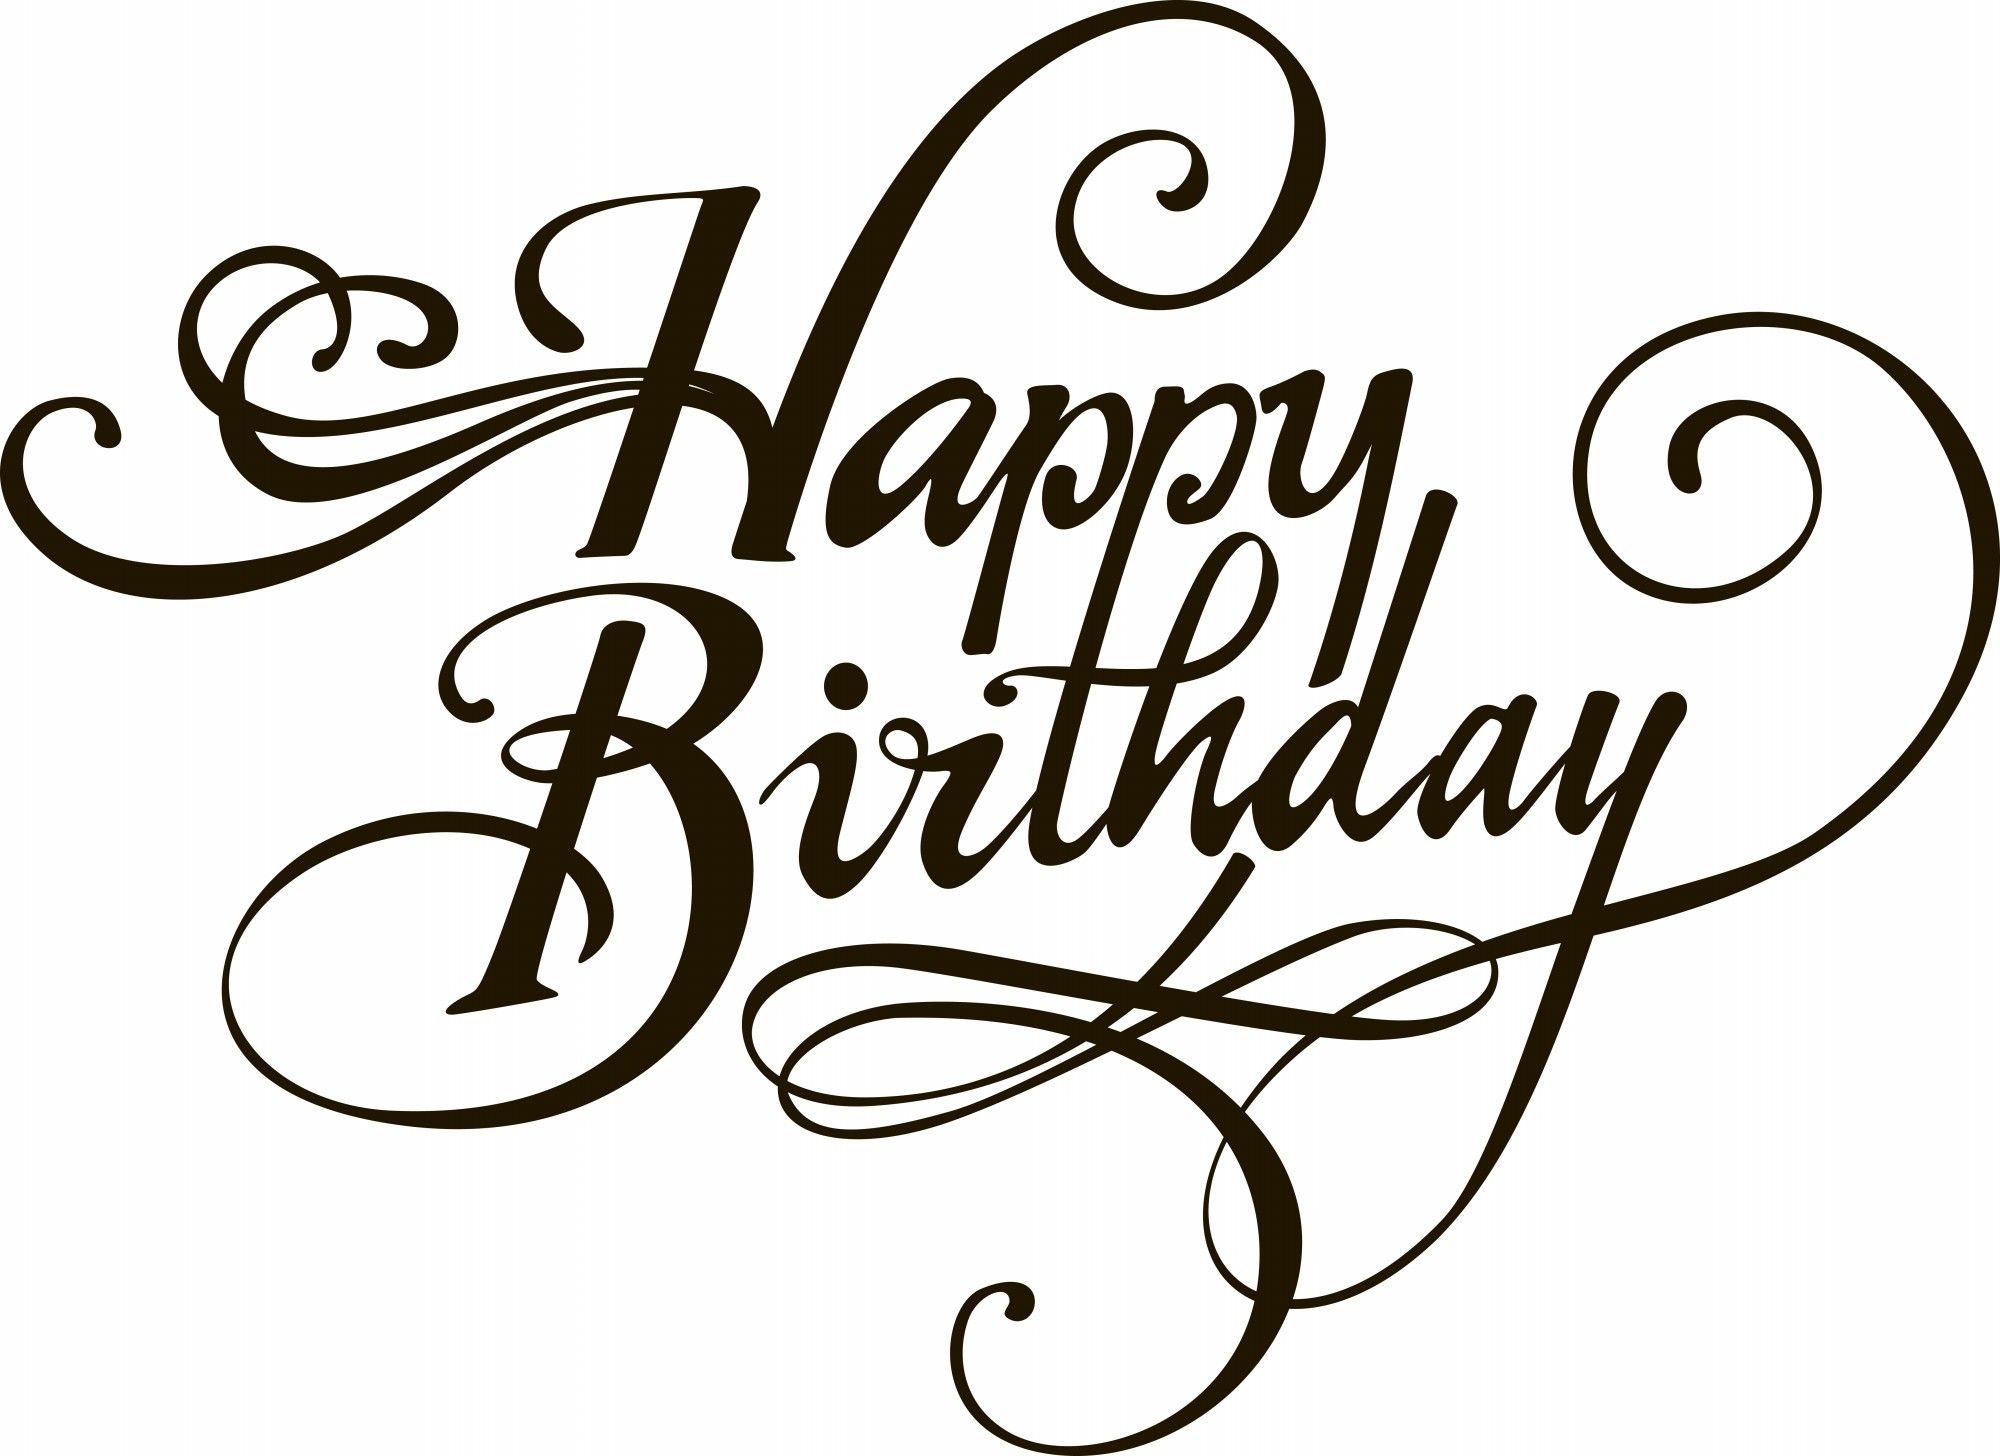 Happy Birthday Card Designs To Draw Happy birthday card